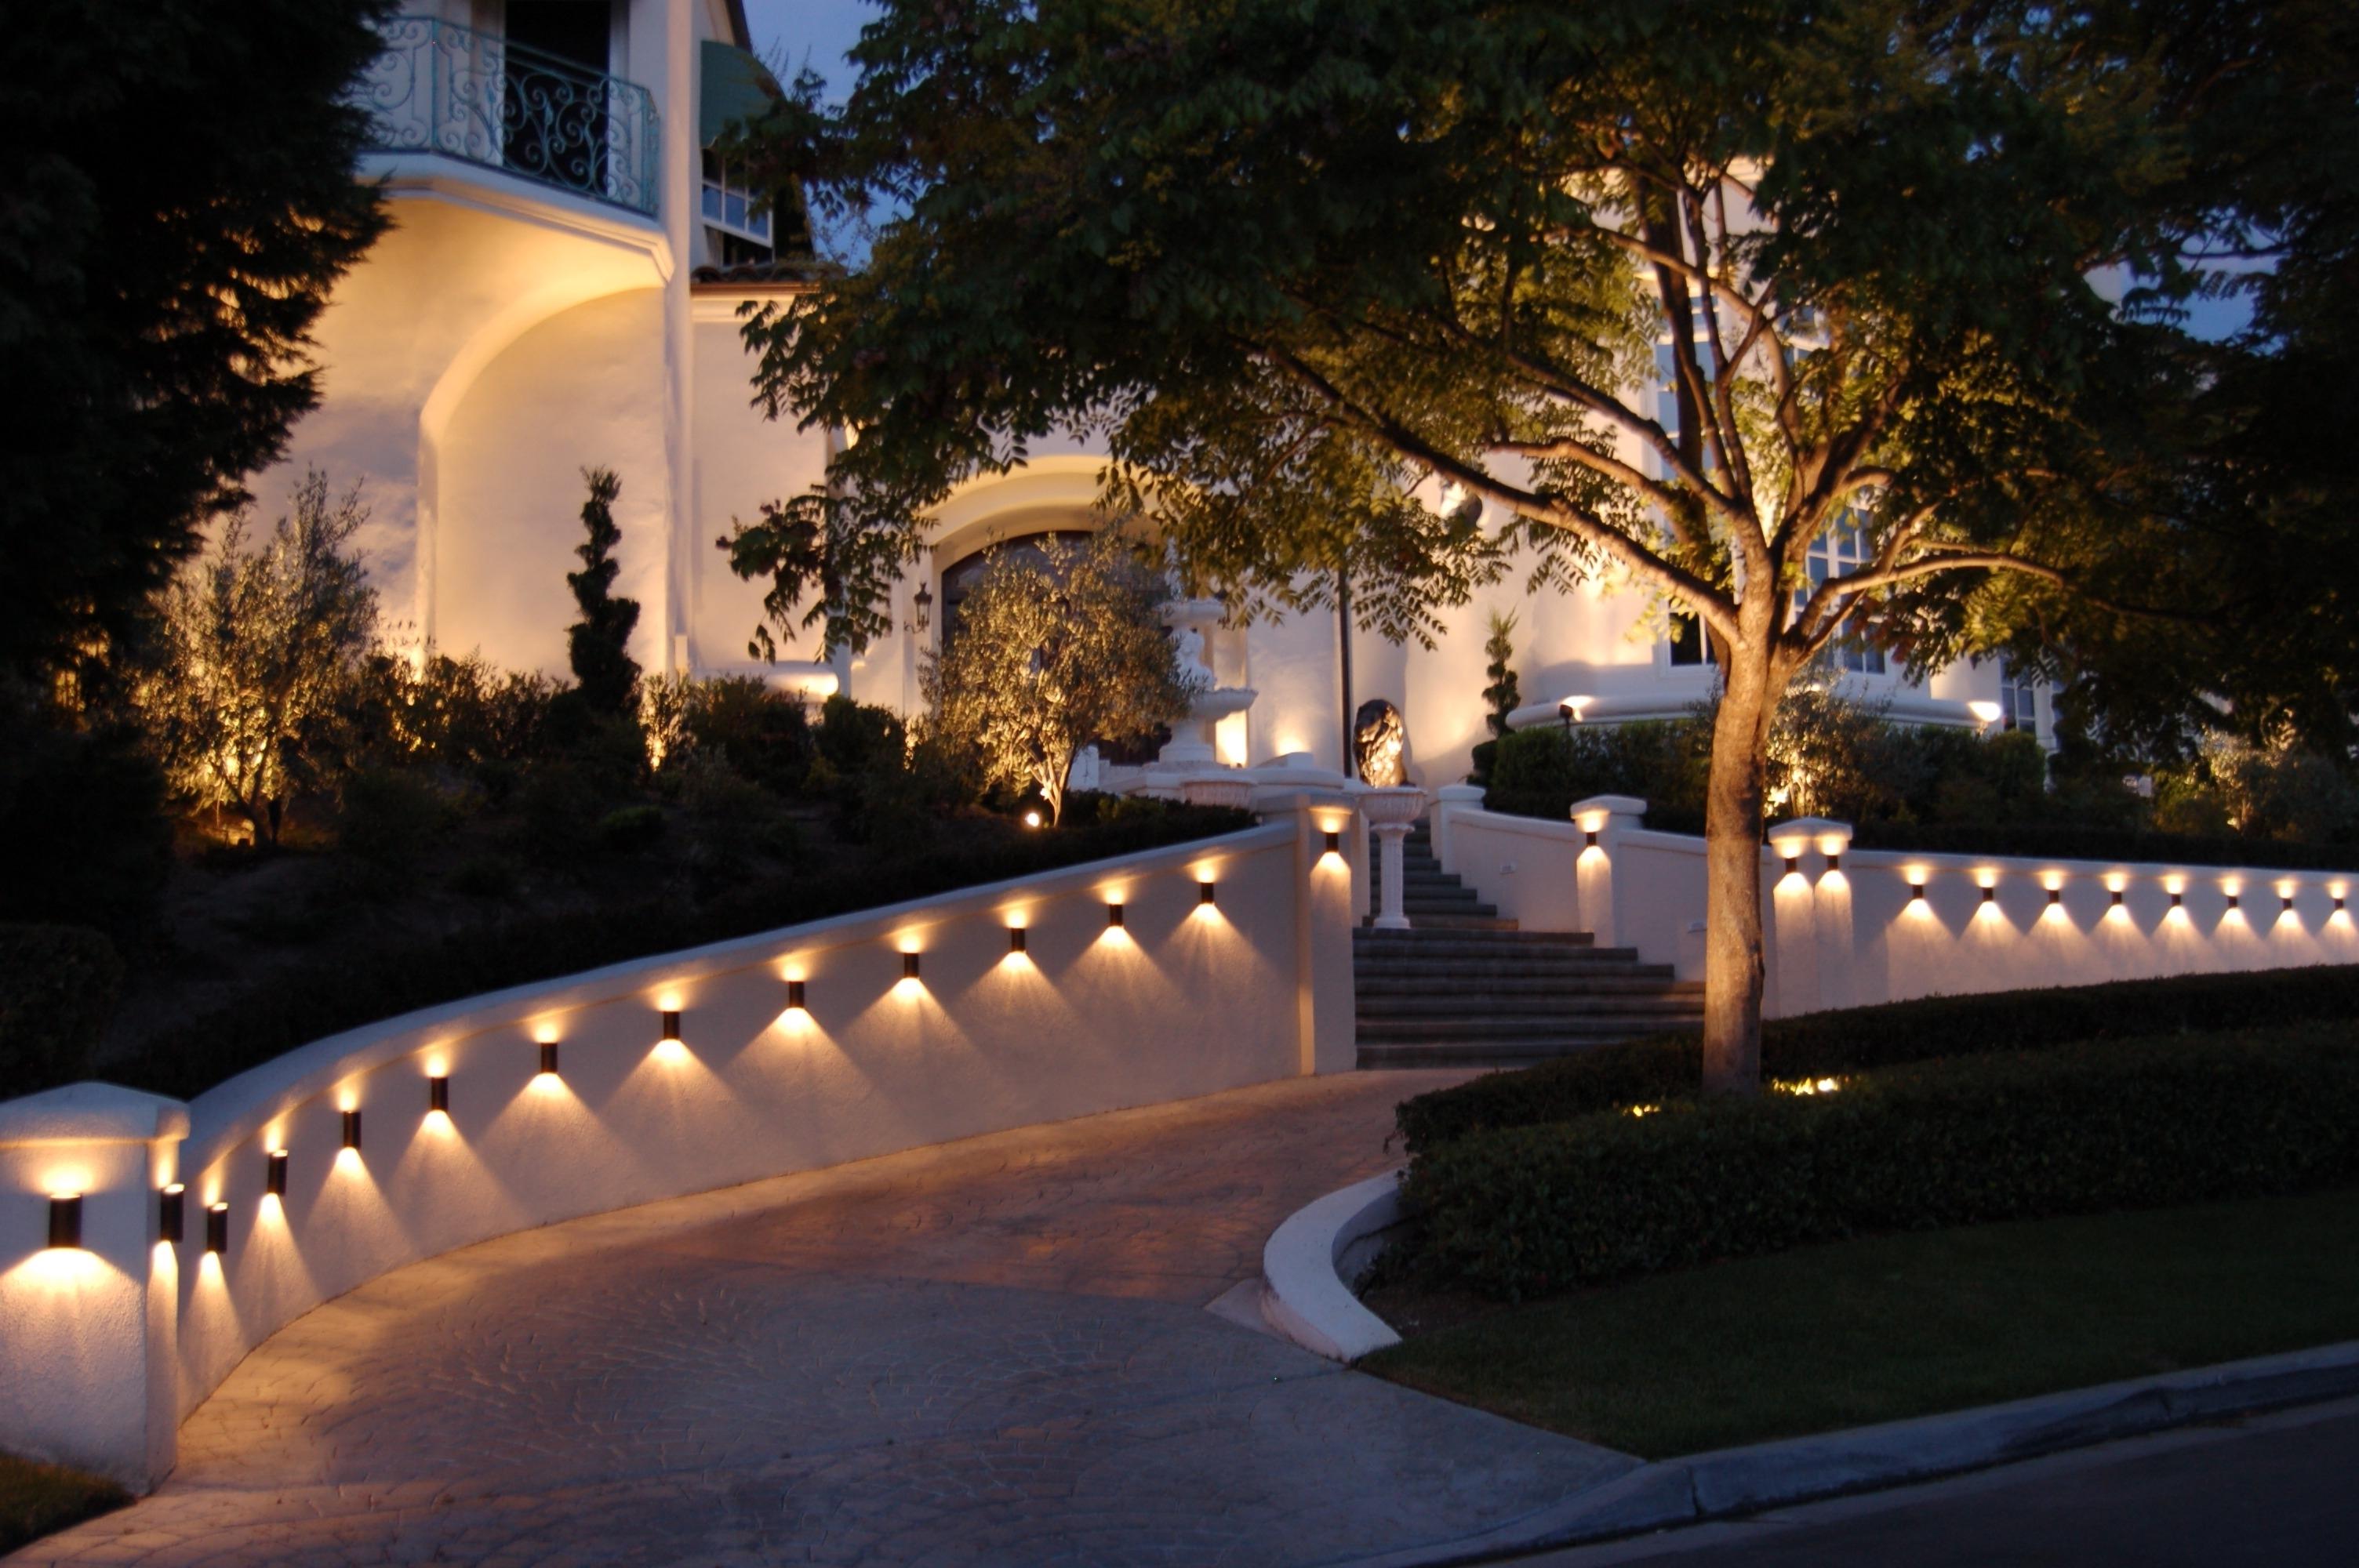 The Best Outdoor Driveway Lanterns